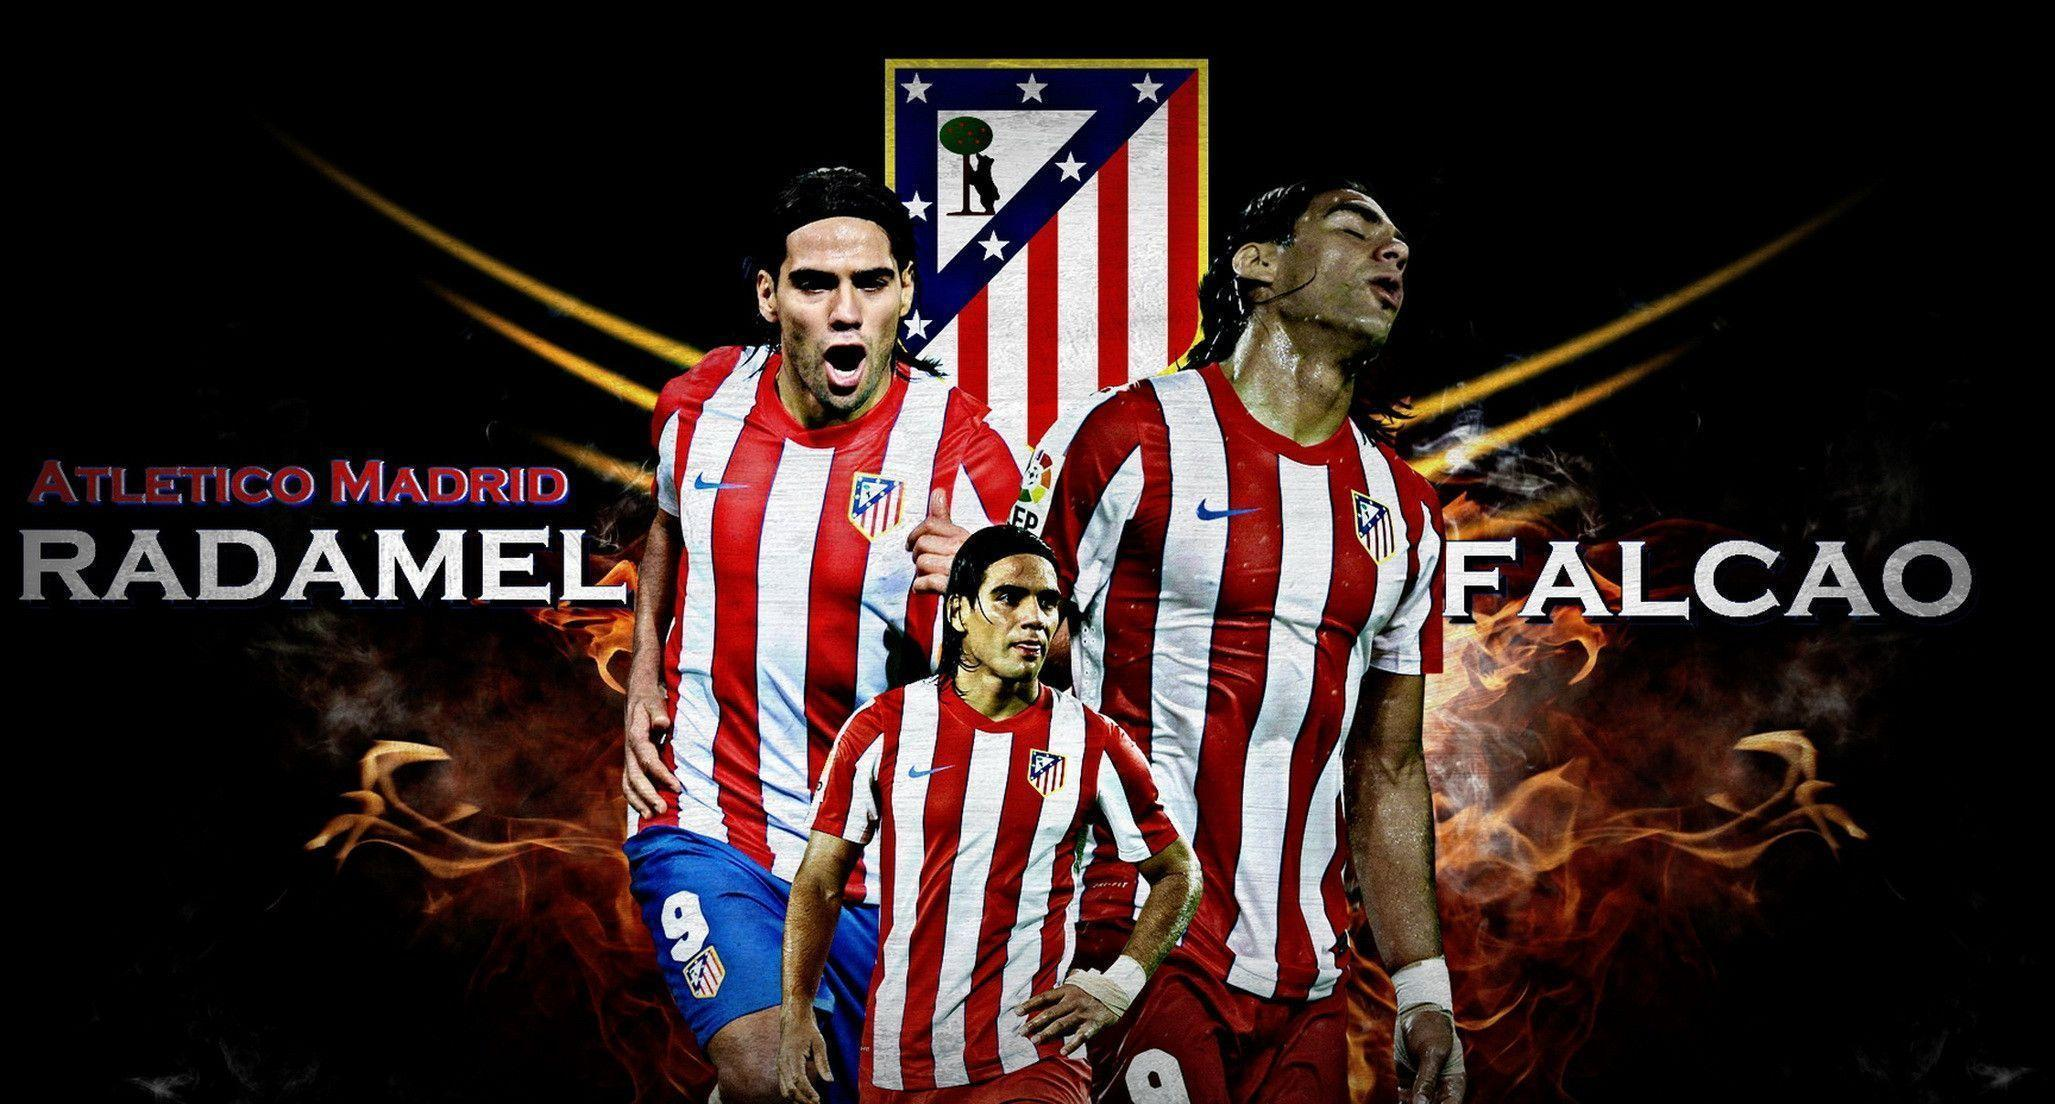 Atletico Madrid Radamel Falcao Wallpaper | Free Download Wallpaper ...